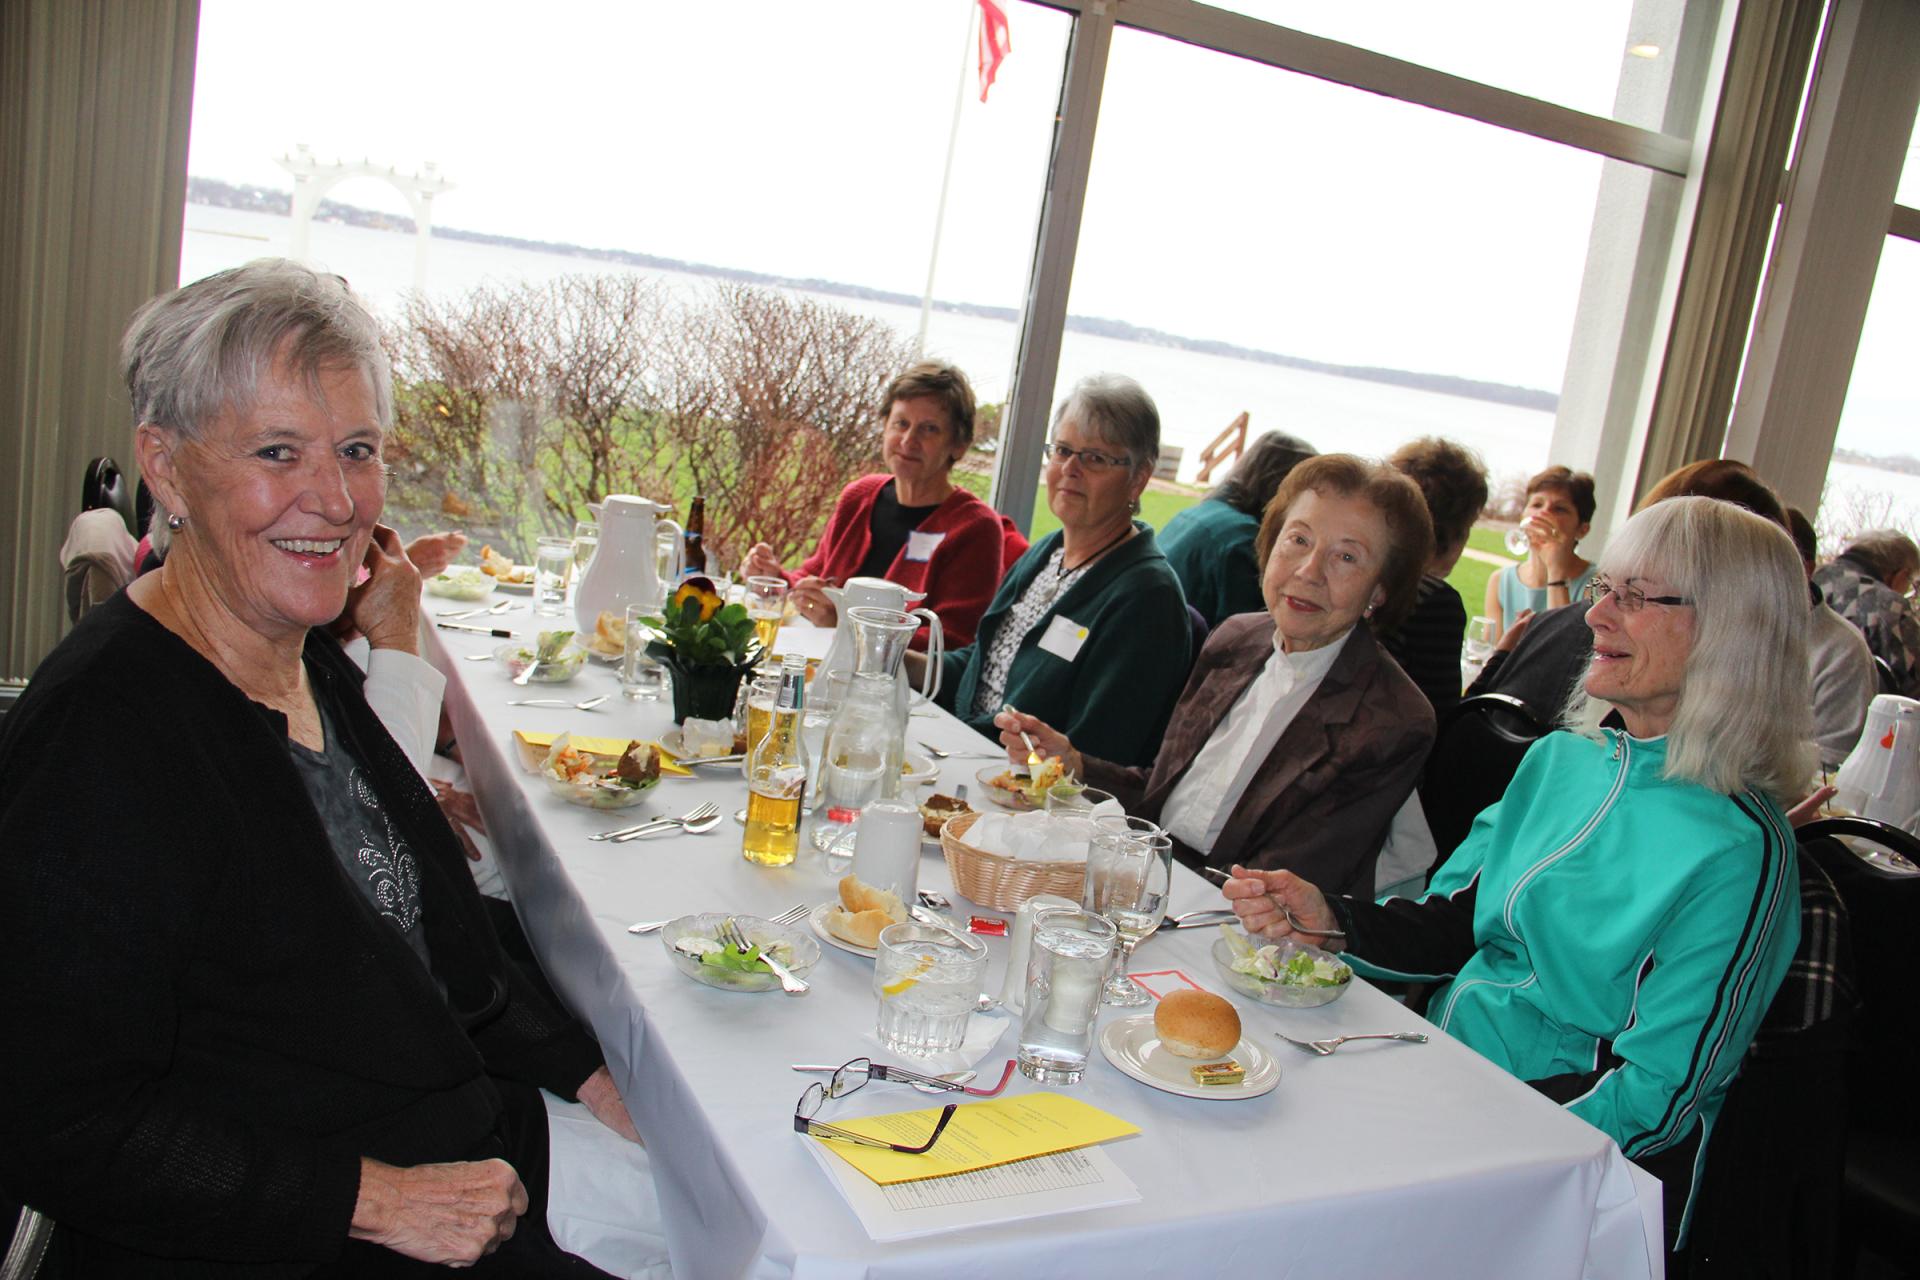 WMGA, women's golf, leagues, Madison, WI